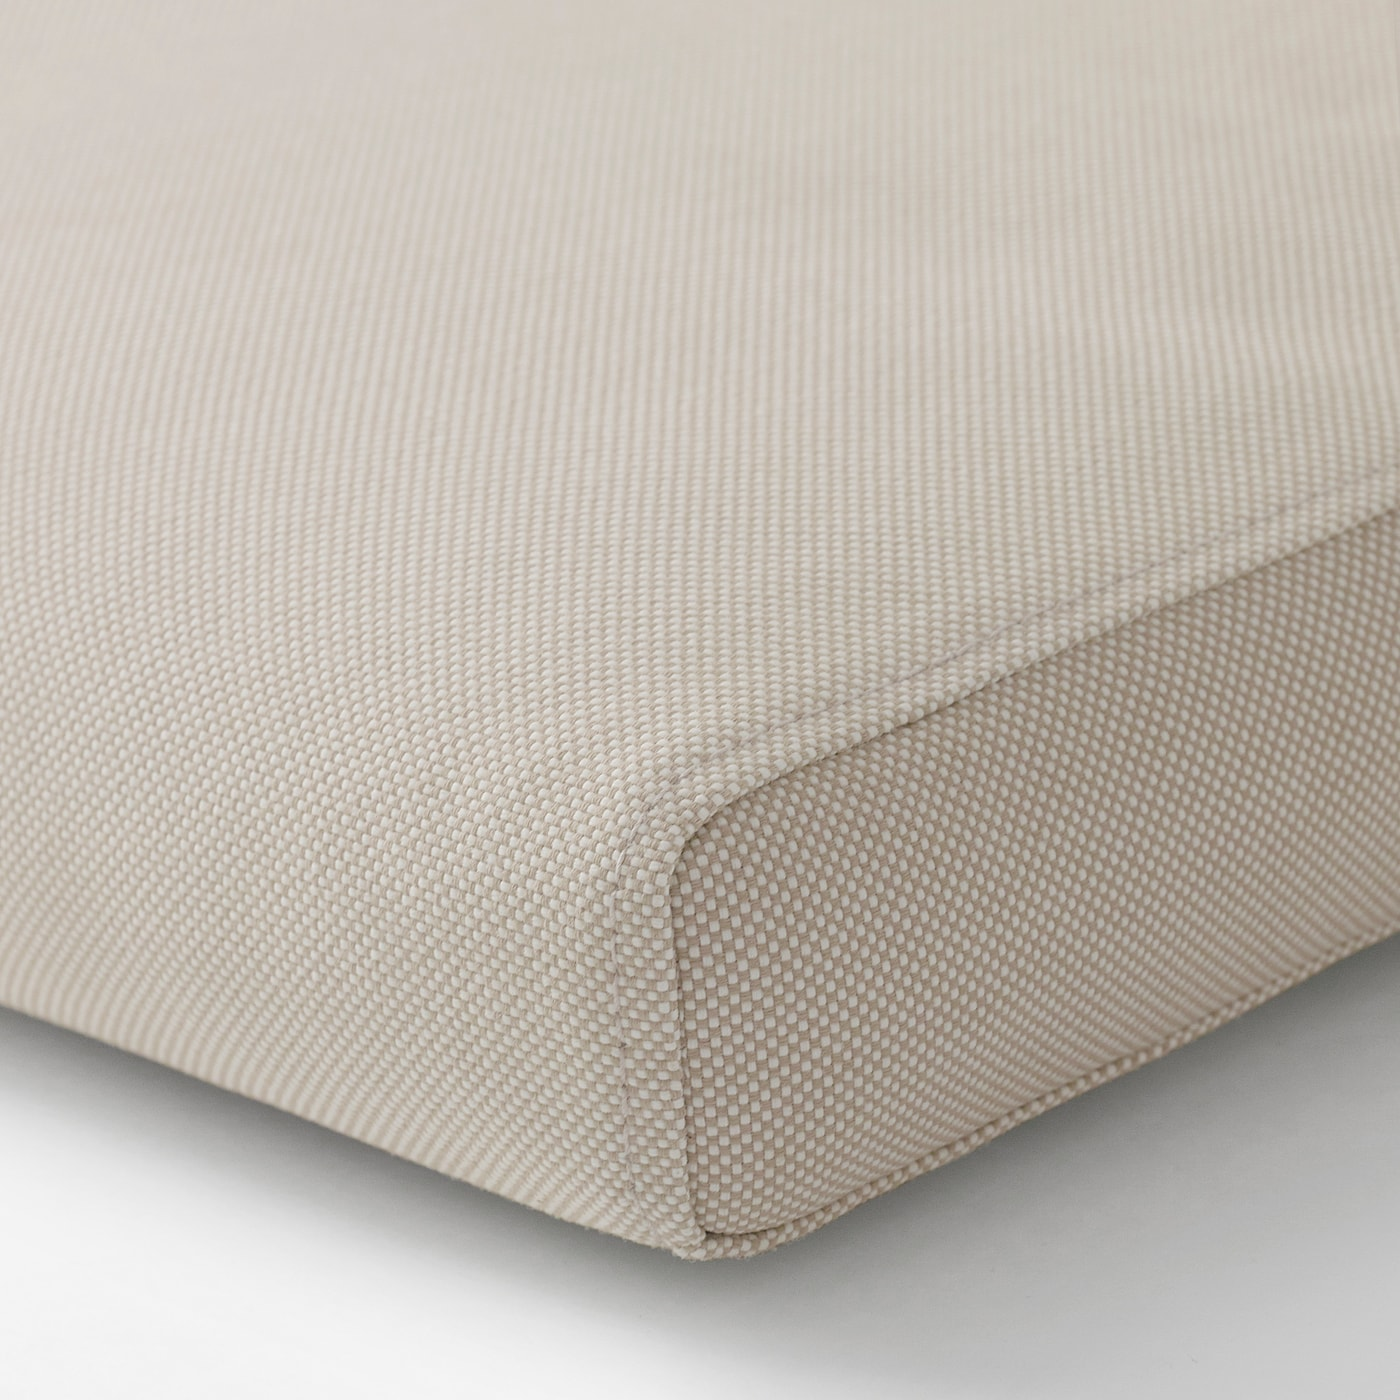 FRÖSÖN/DUVHOLMEN Sitt-/ryggdyna, utomhus, beige, 116x45 cm